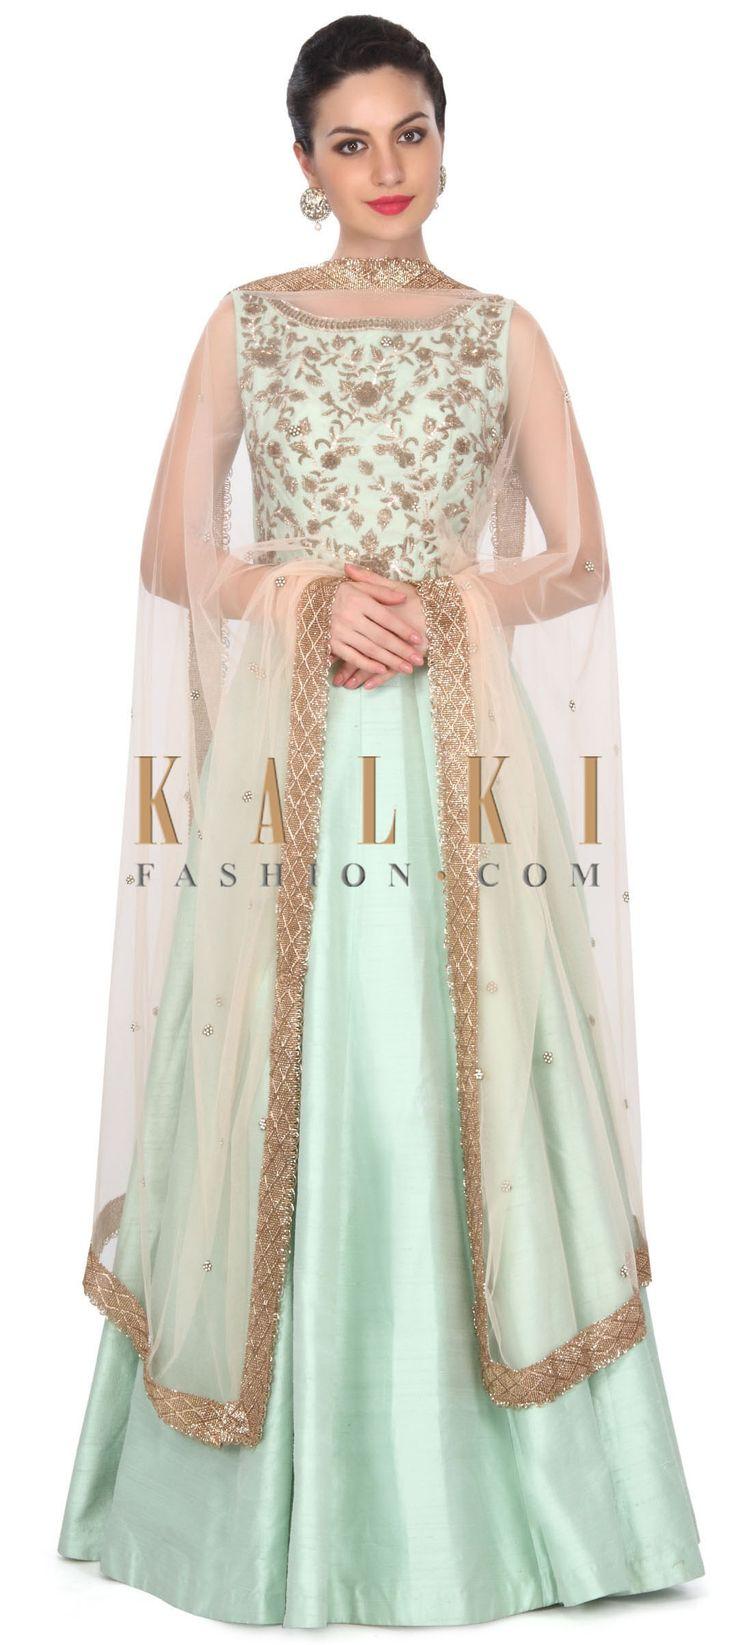 Best Ideas About Salwar Designs On Pinterest Designs Kurta - How to make designer dress at home